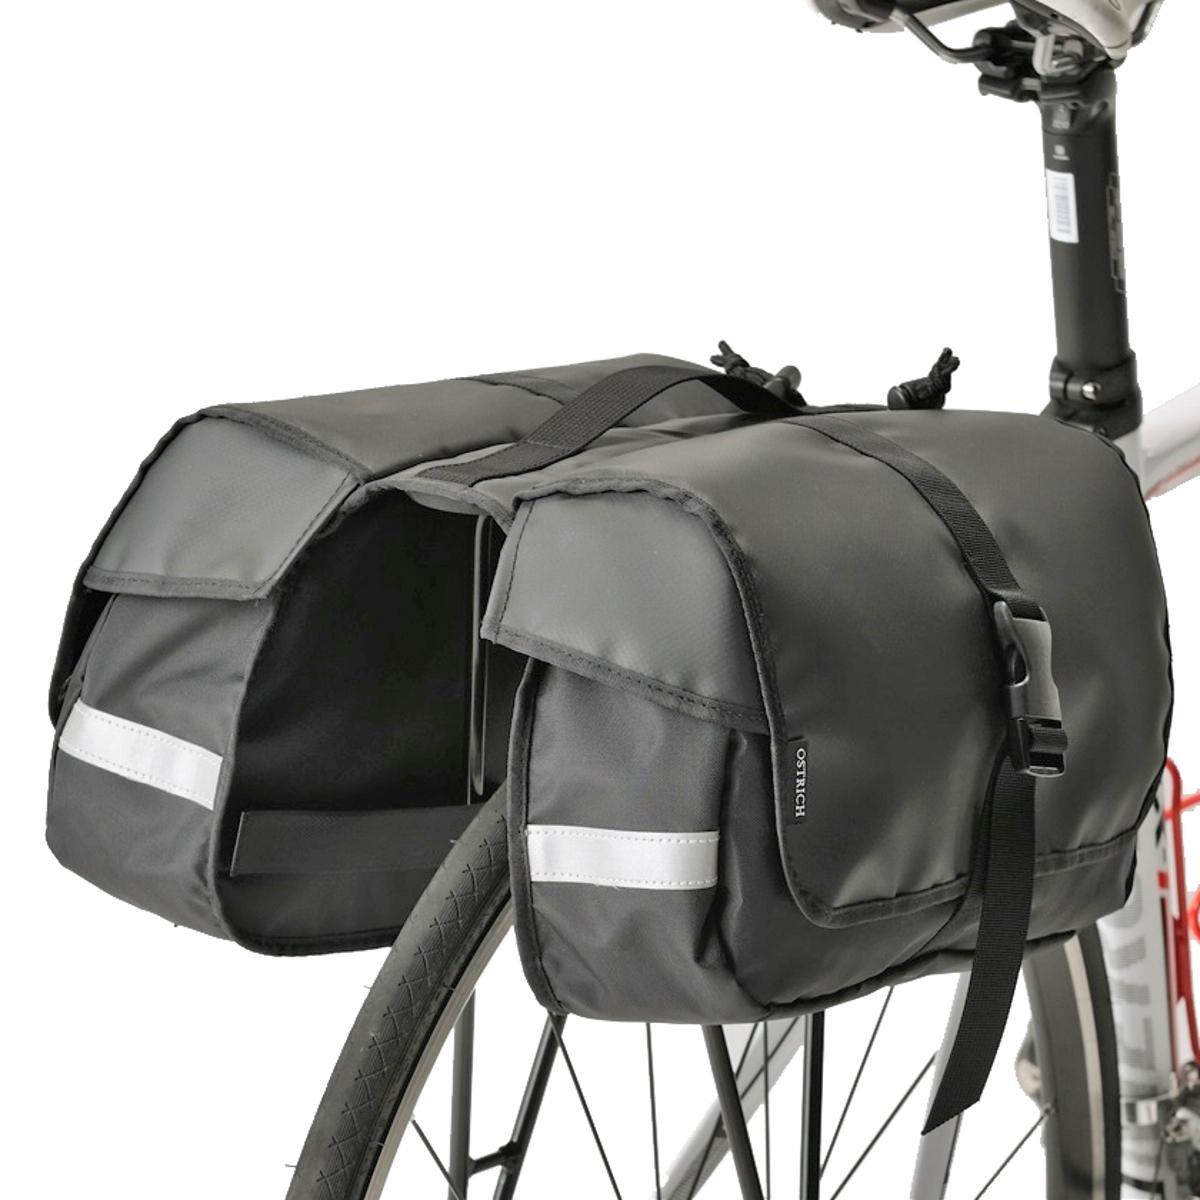 Minoura RC-1000 One Day Pannier Bag and Slim Bicycle Rack Combo, Black